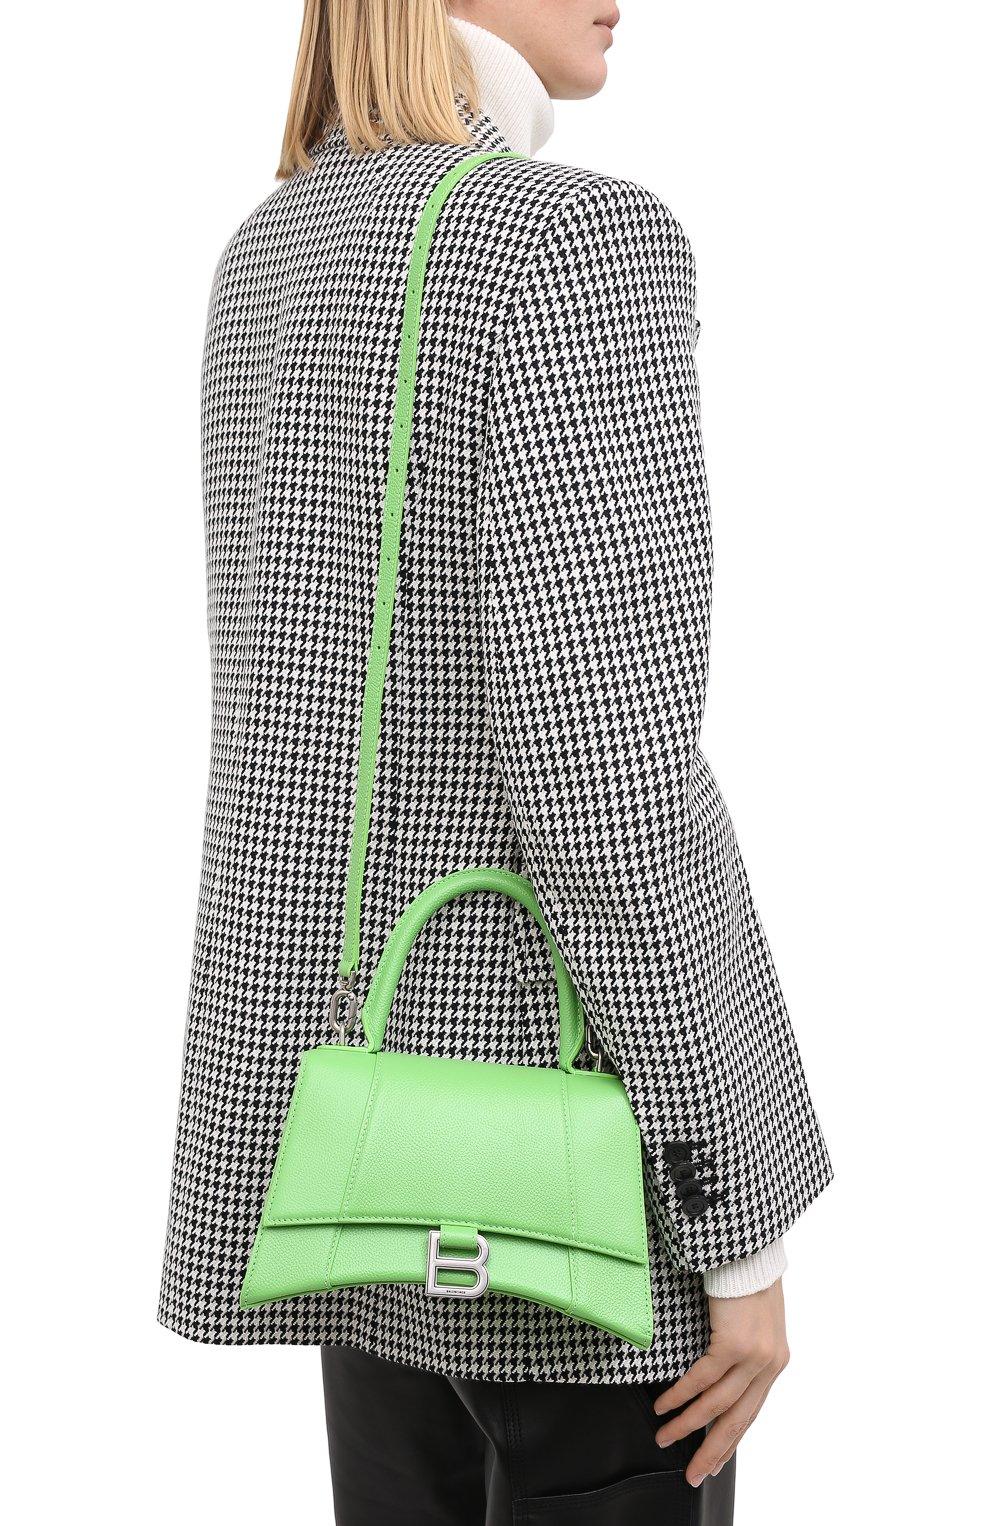 Женская сумка hourglass s BALENCIAGA светло-зеленого цвета, арт. 593546/1IZHY | Фото 5